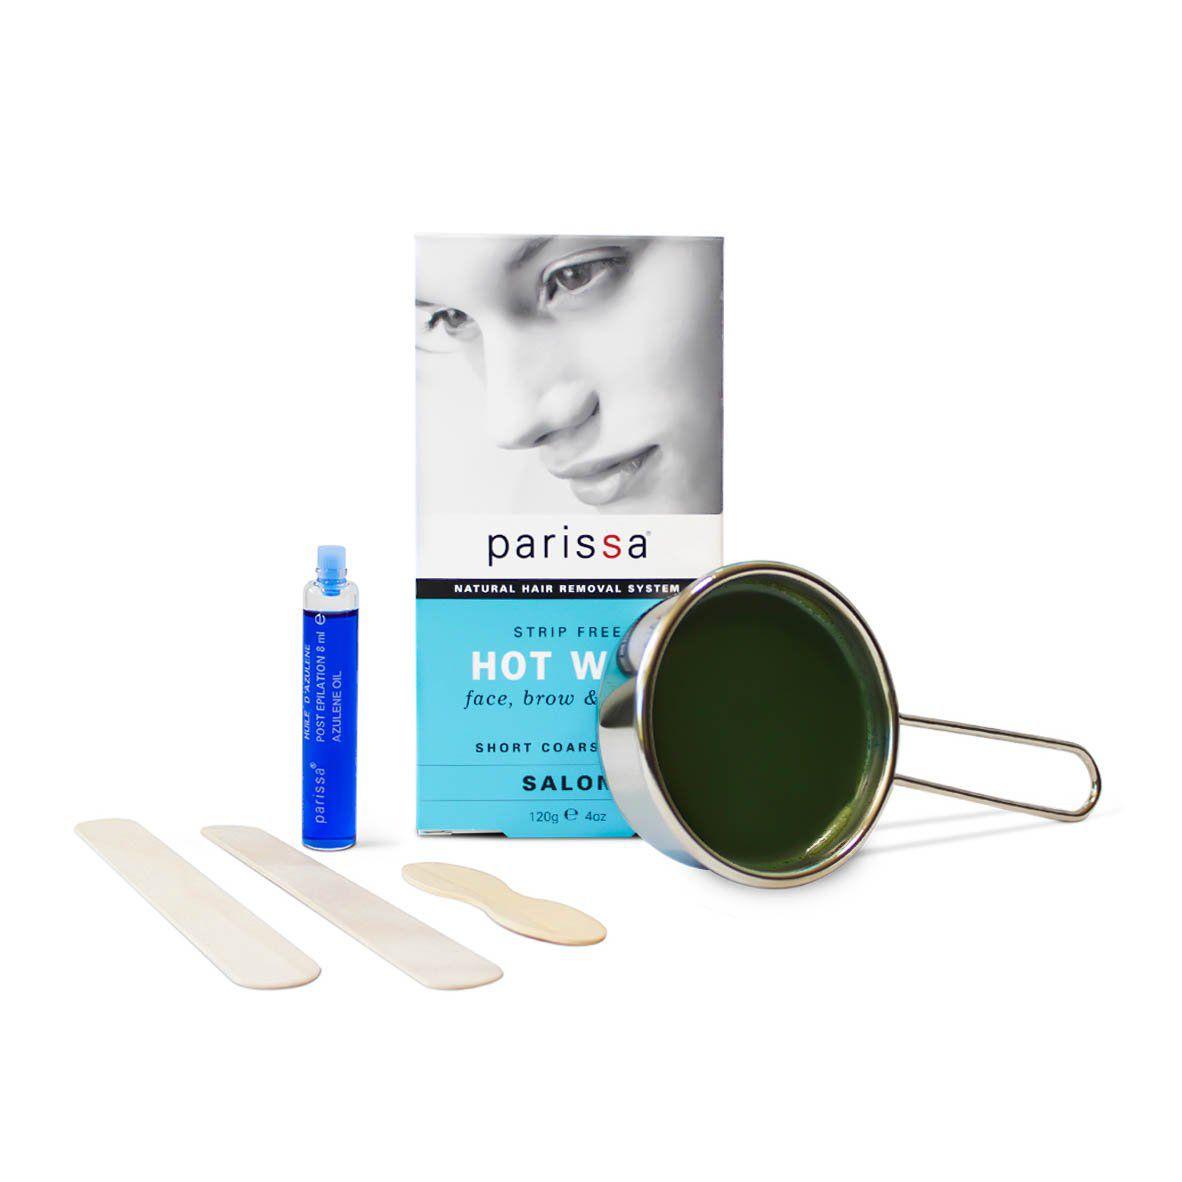 Parissa Hot Wax Strip-Free Natural Hair Removal System